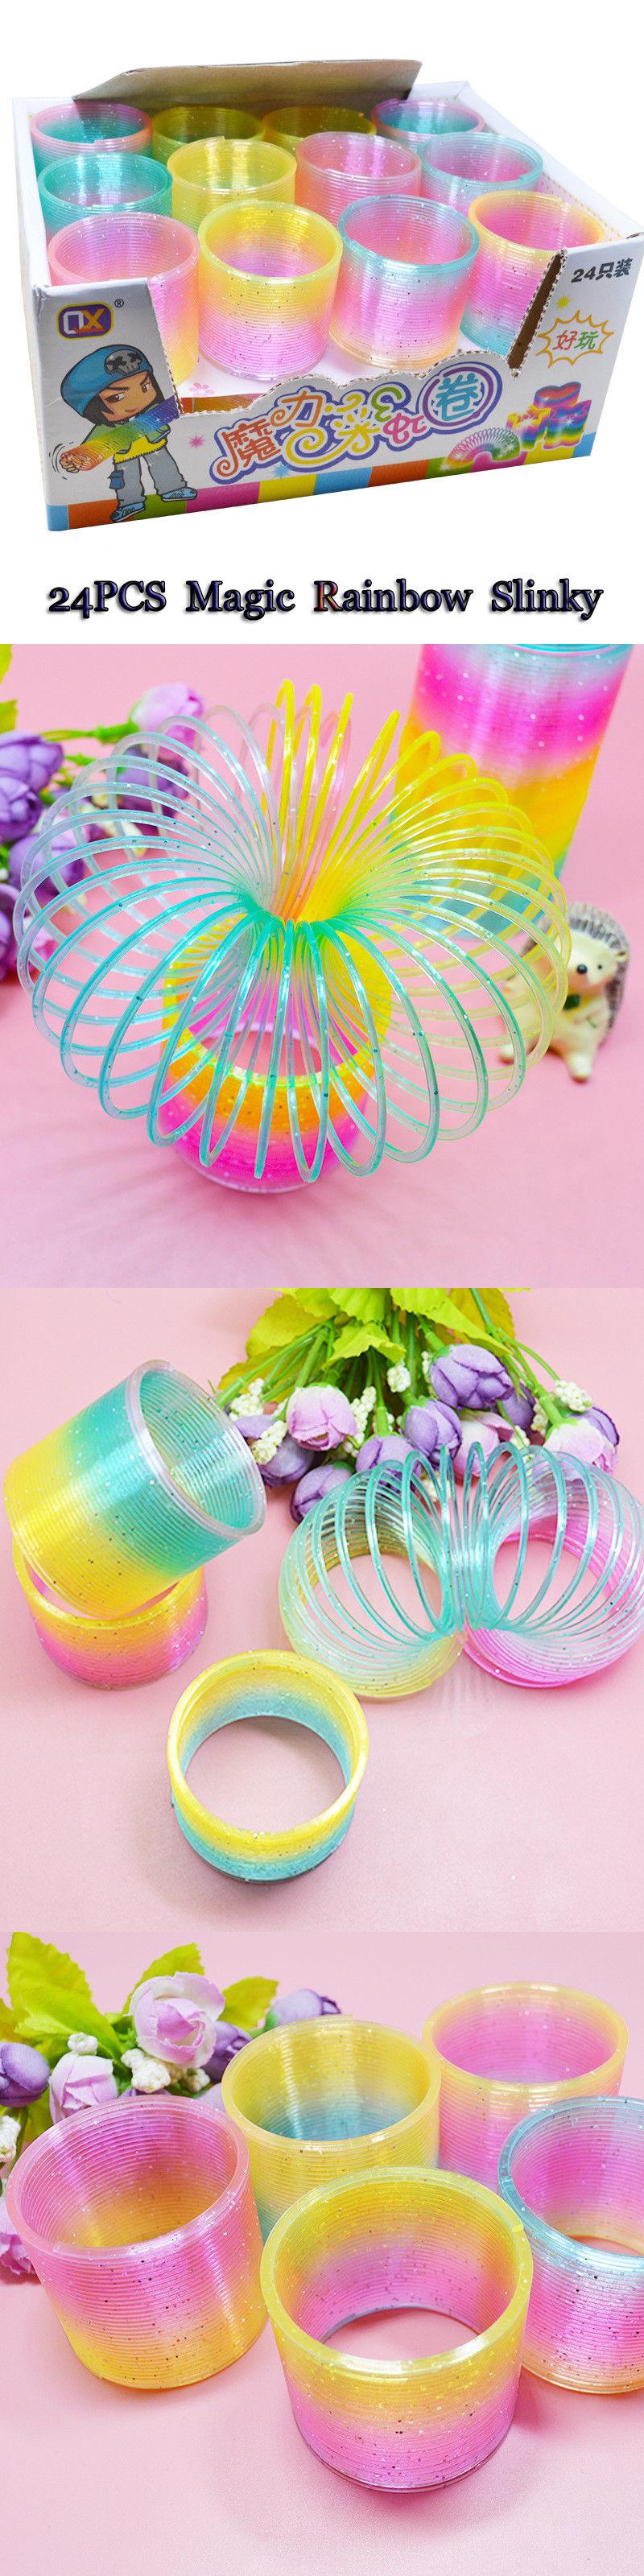 Slinky Kids Toys Magic Plastic Slinky Rainbow Colorful